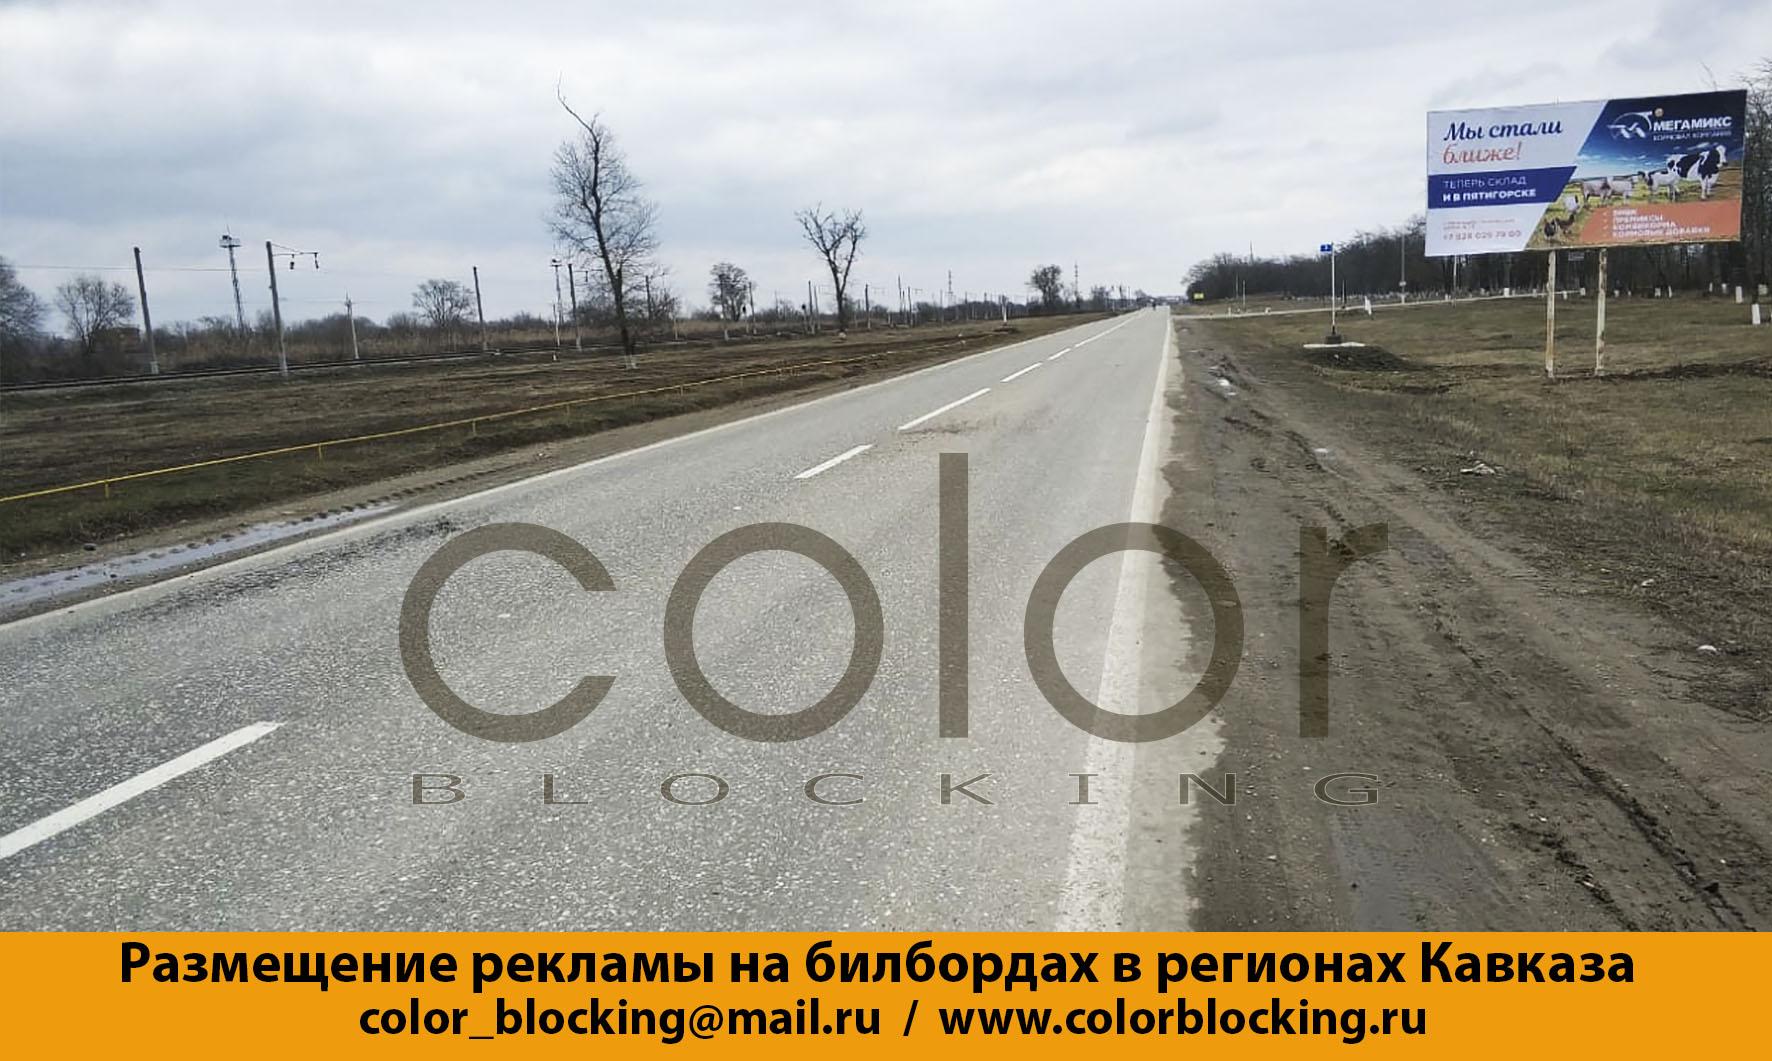 Реклама на билбордах на Кавказе Чечня